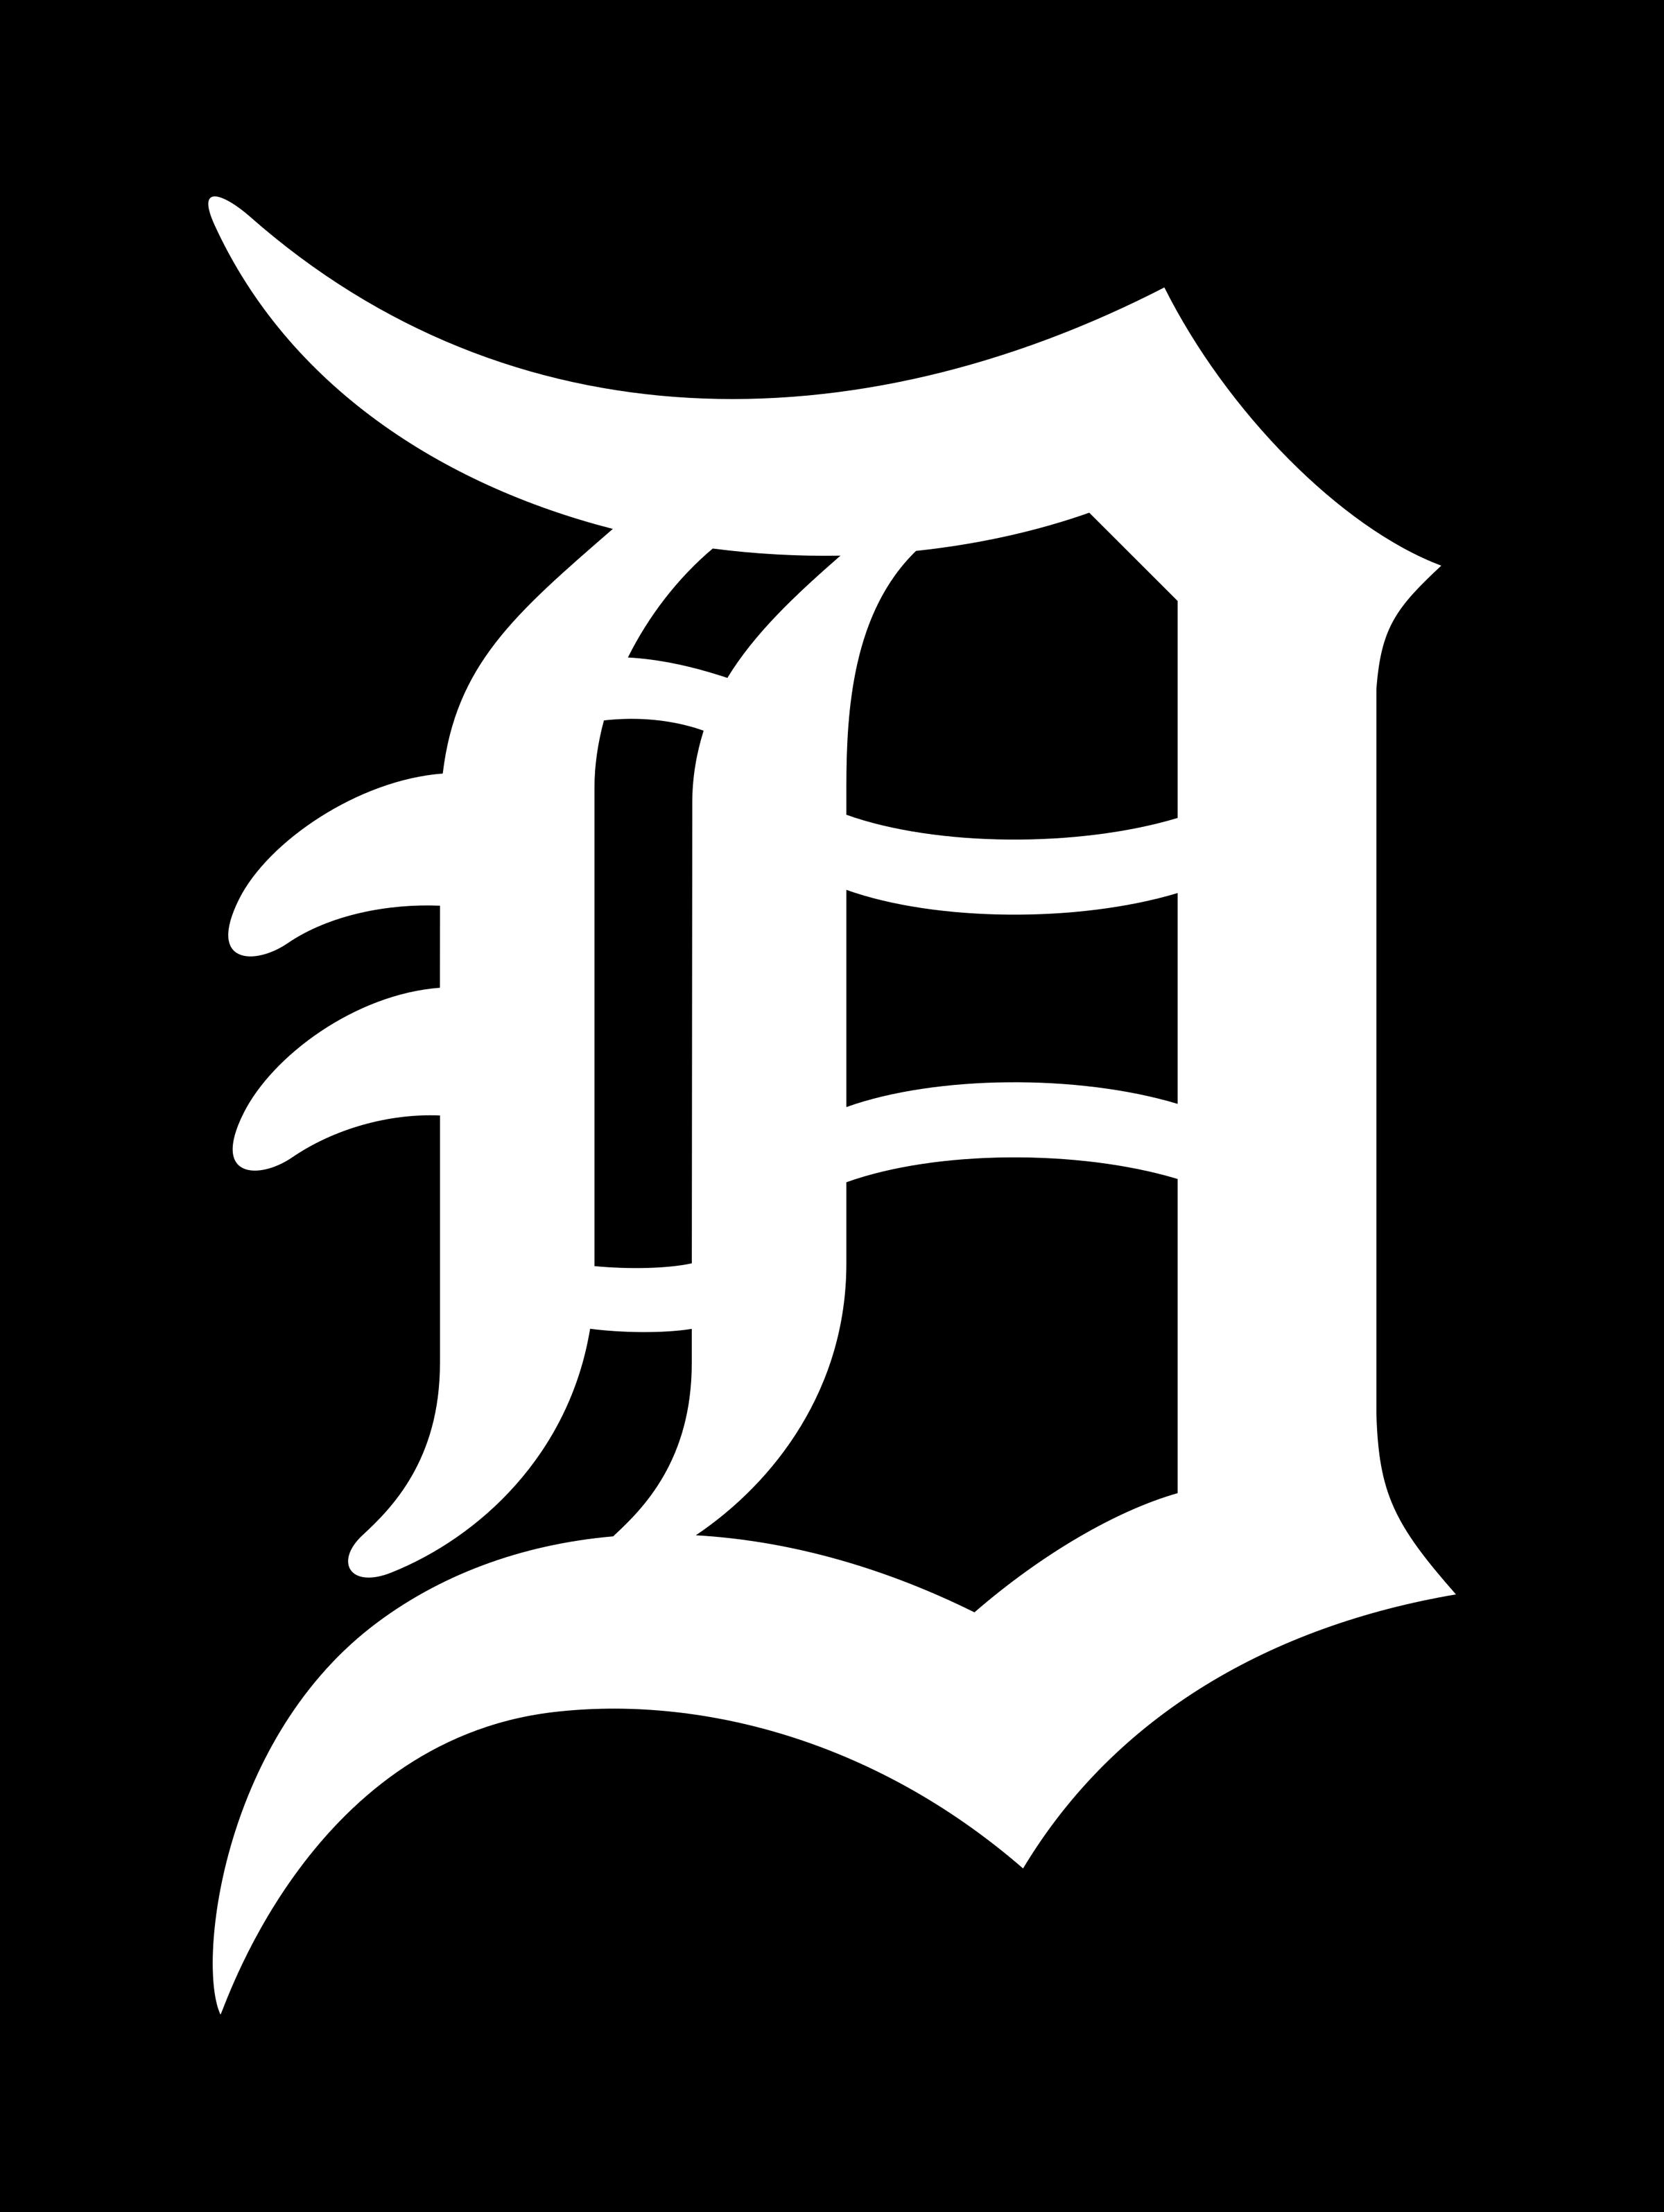 Detroit Tigers Logo Png Transparent Svg Vector Freebie Supply Detroit Tigers Tiger Logo Detroit Logo